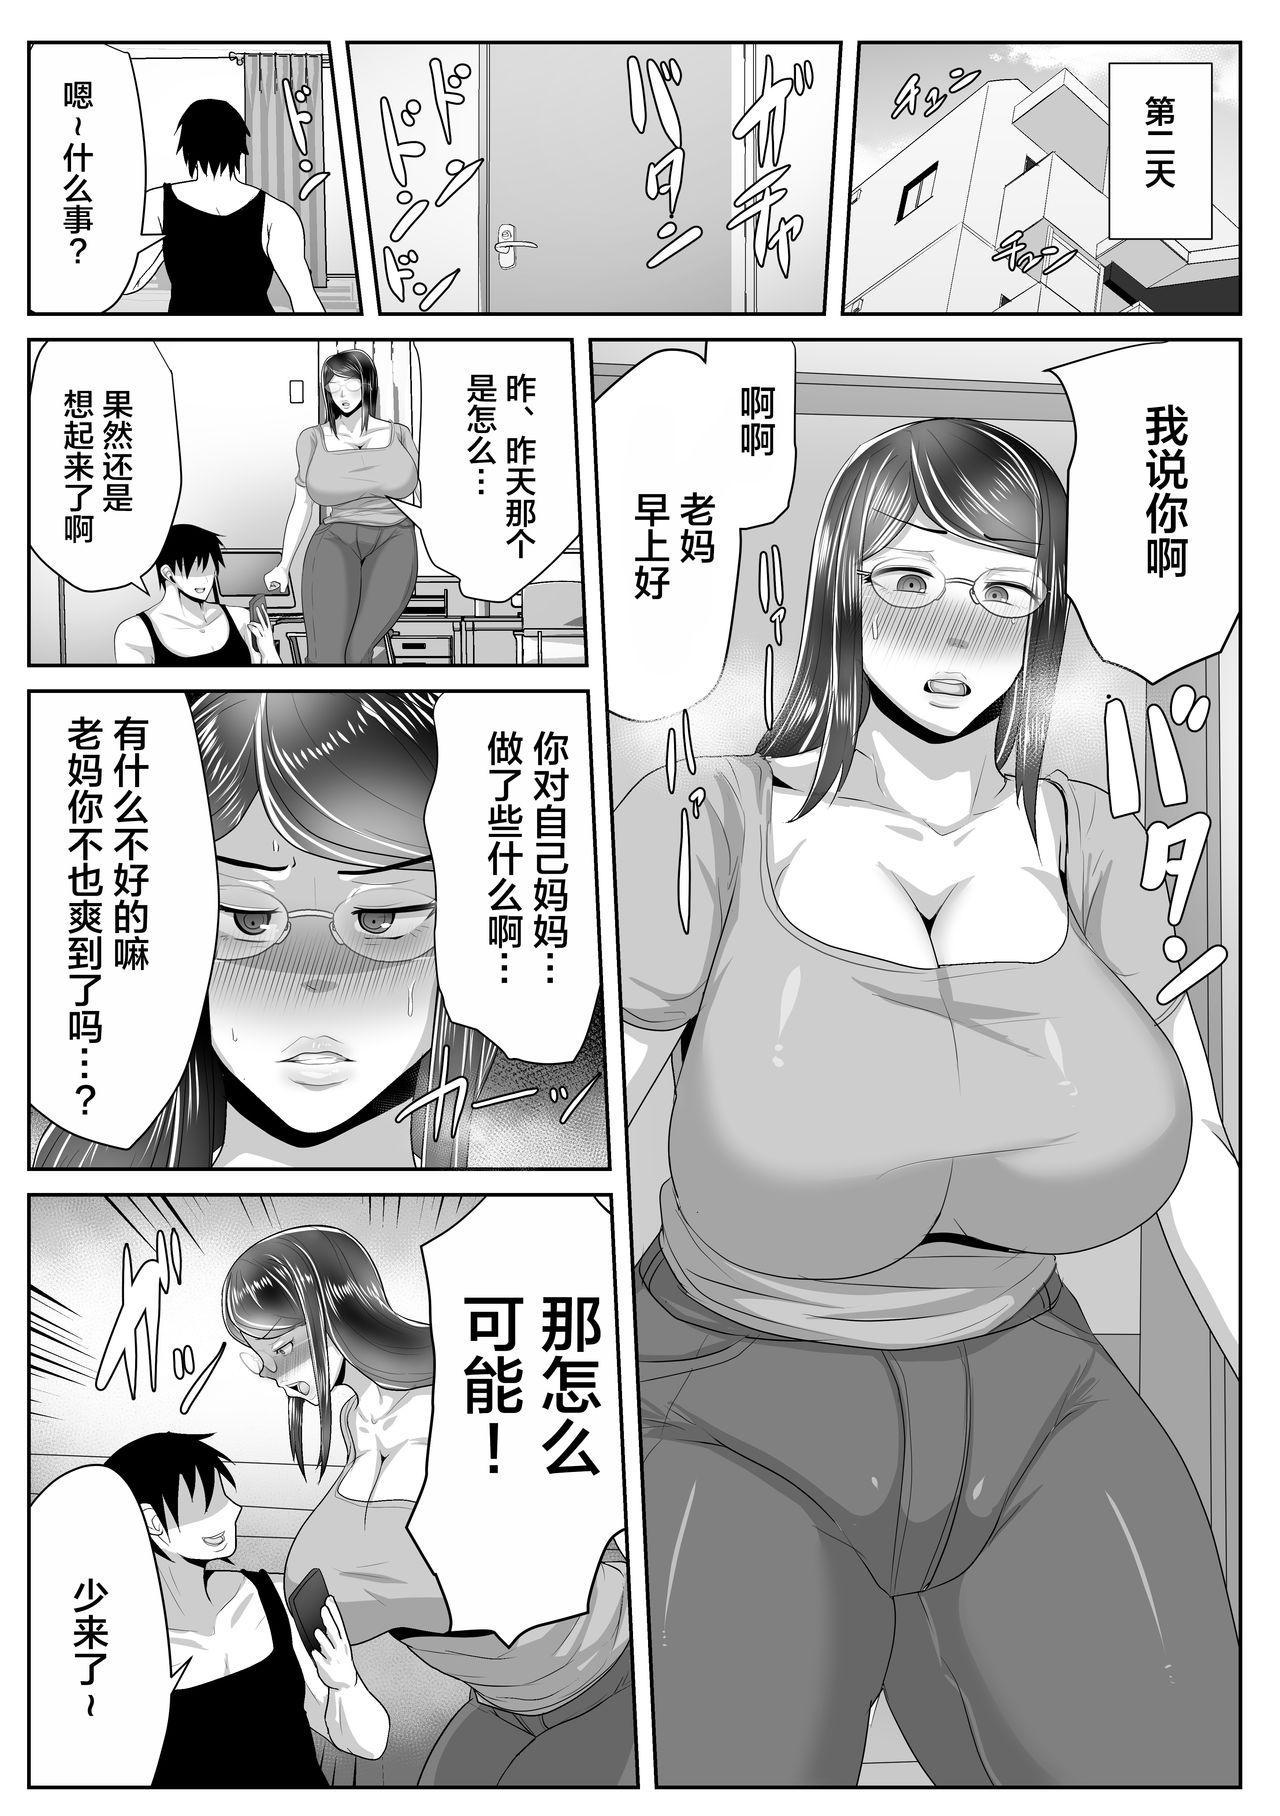 [Akikan] Kaa-san Senyou Saimin Appli[Chinese]【不可视汉化】 27